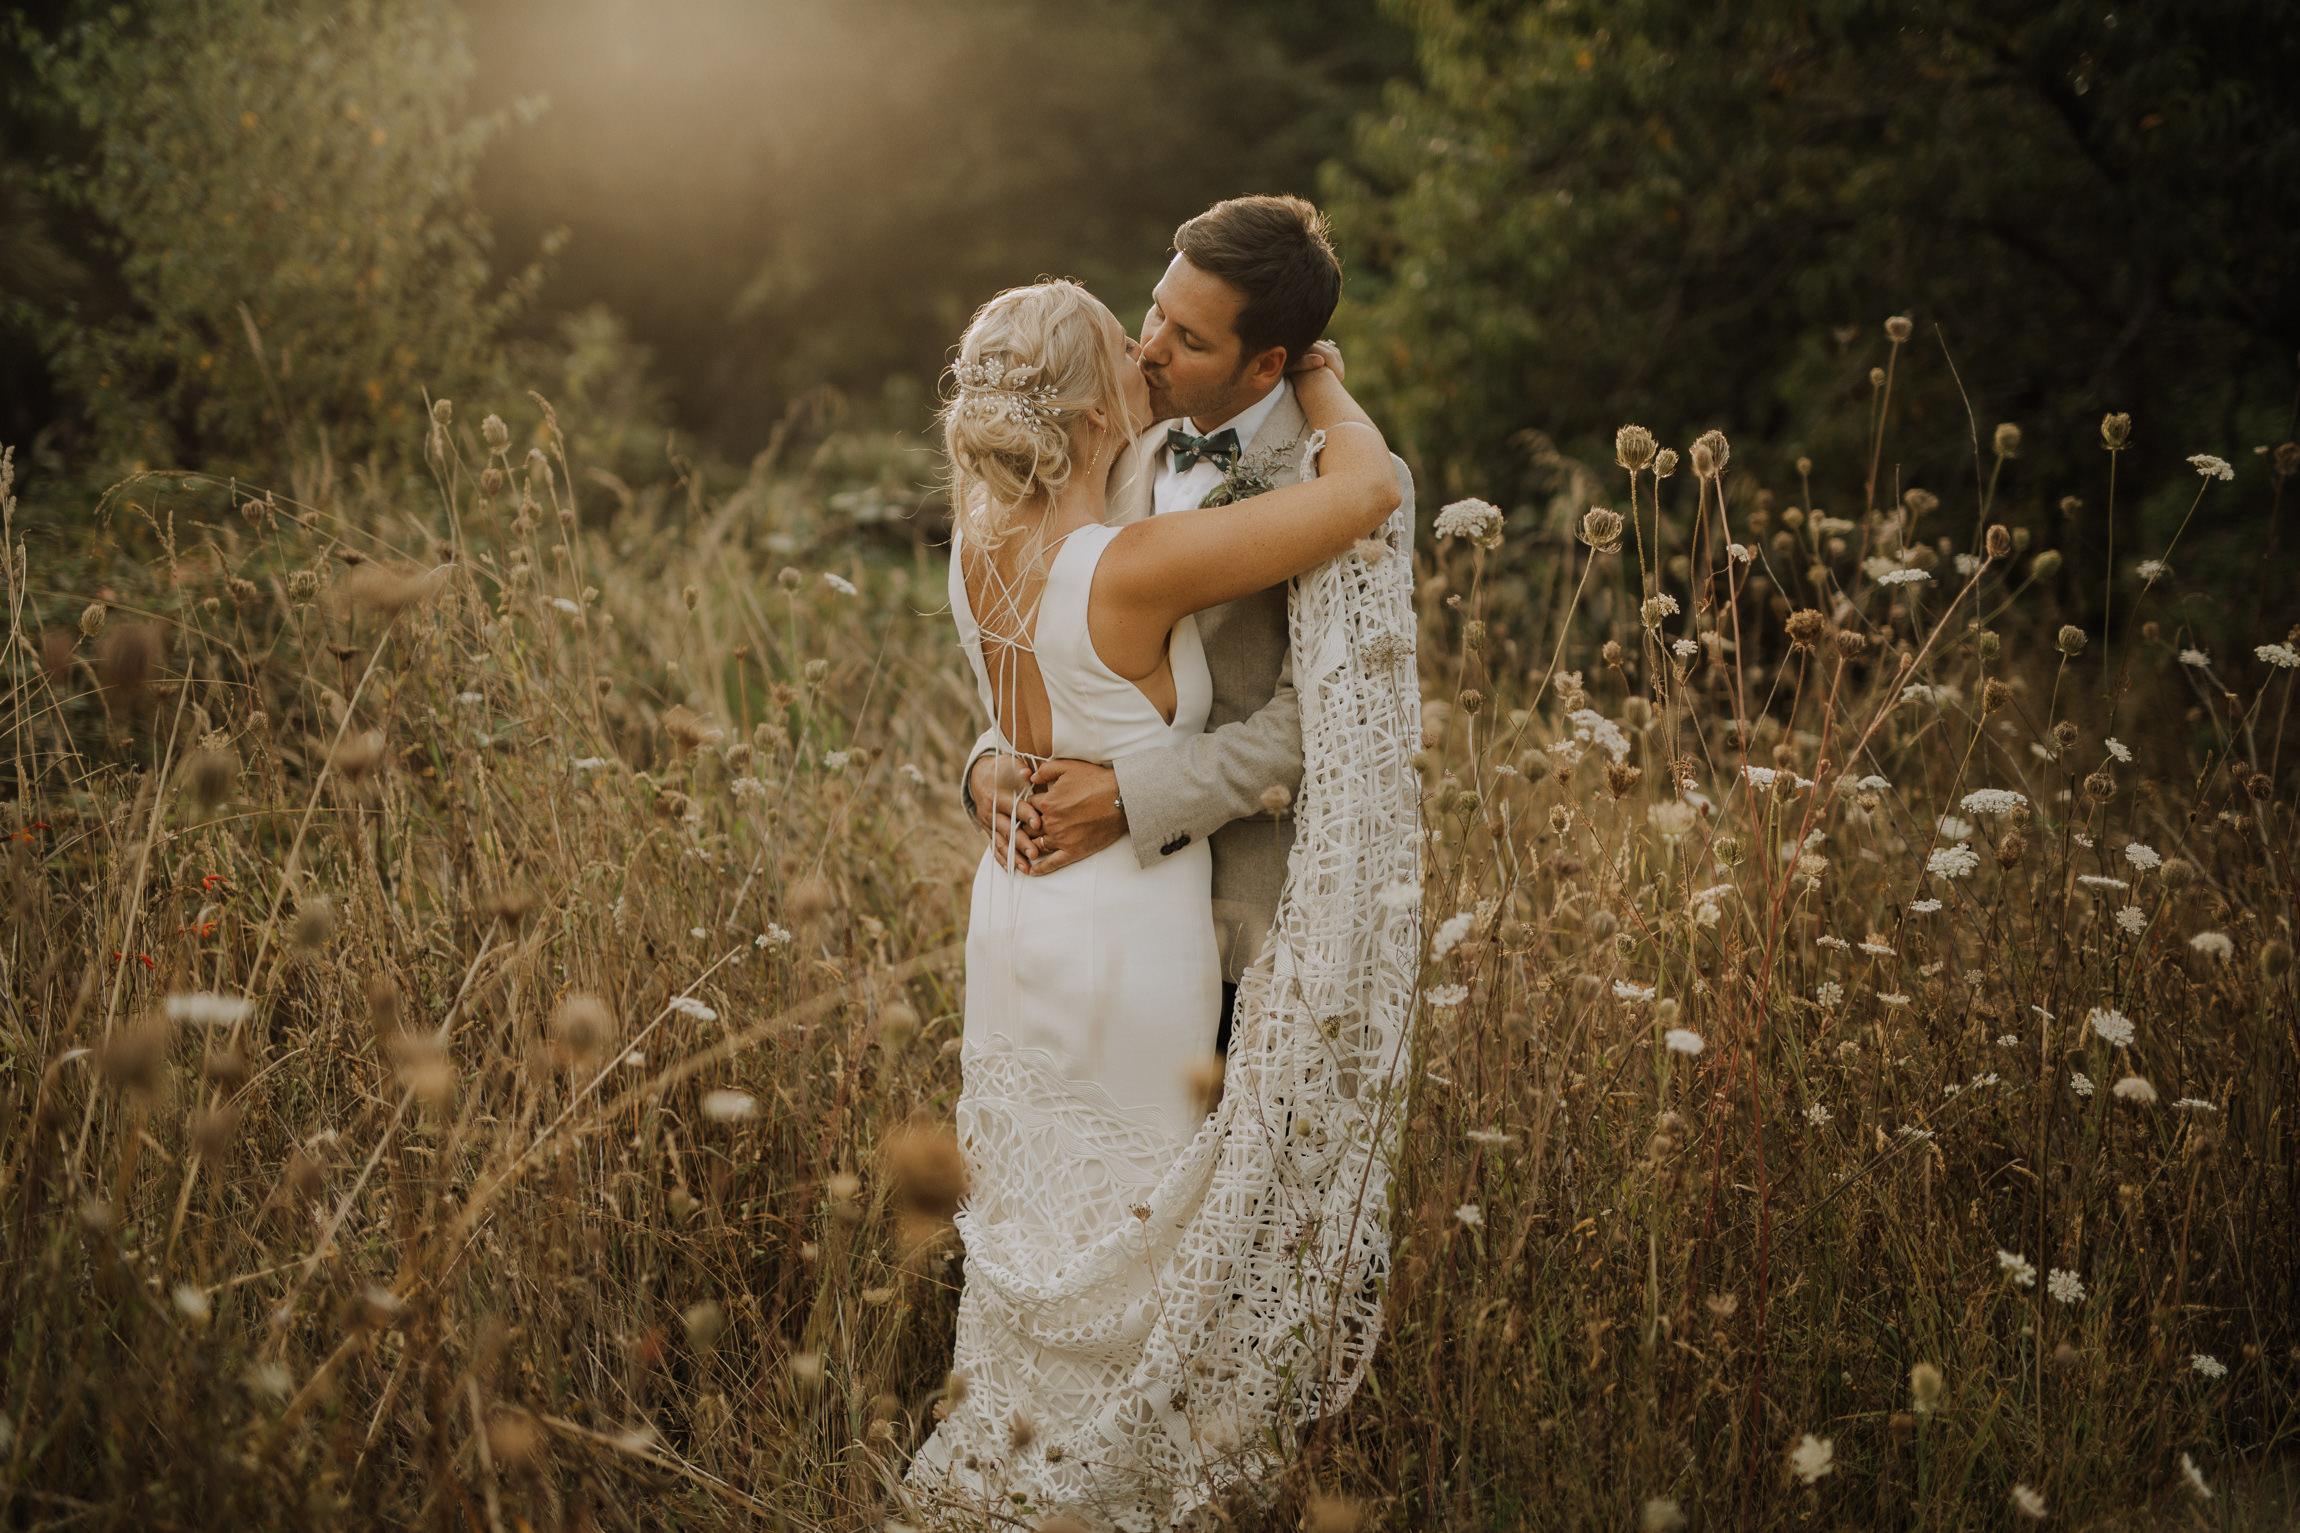 oldforestschool-wedding-blog-162.jpg